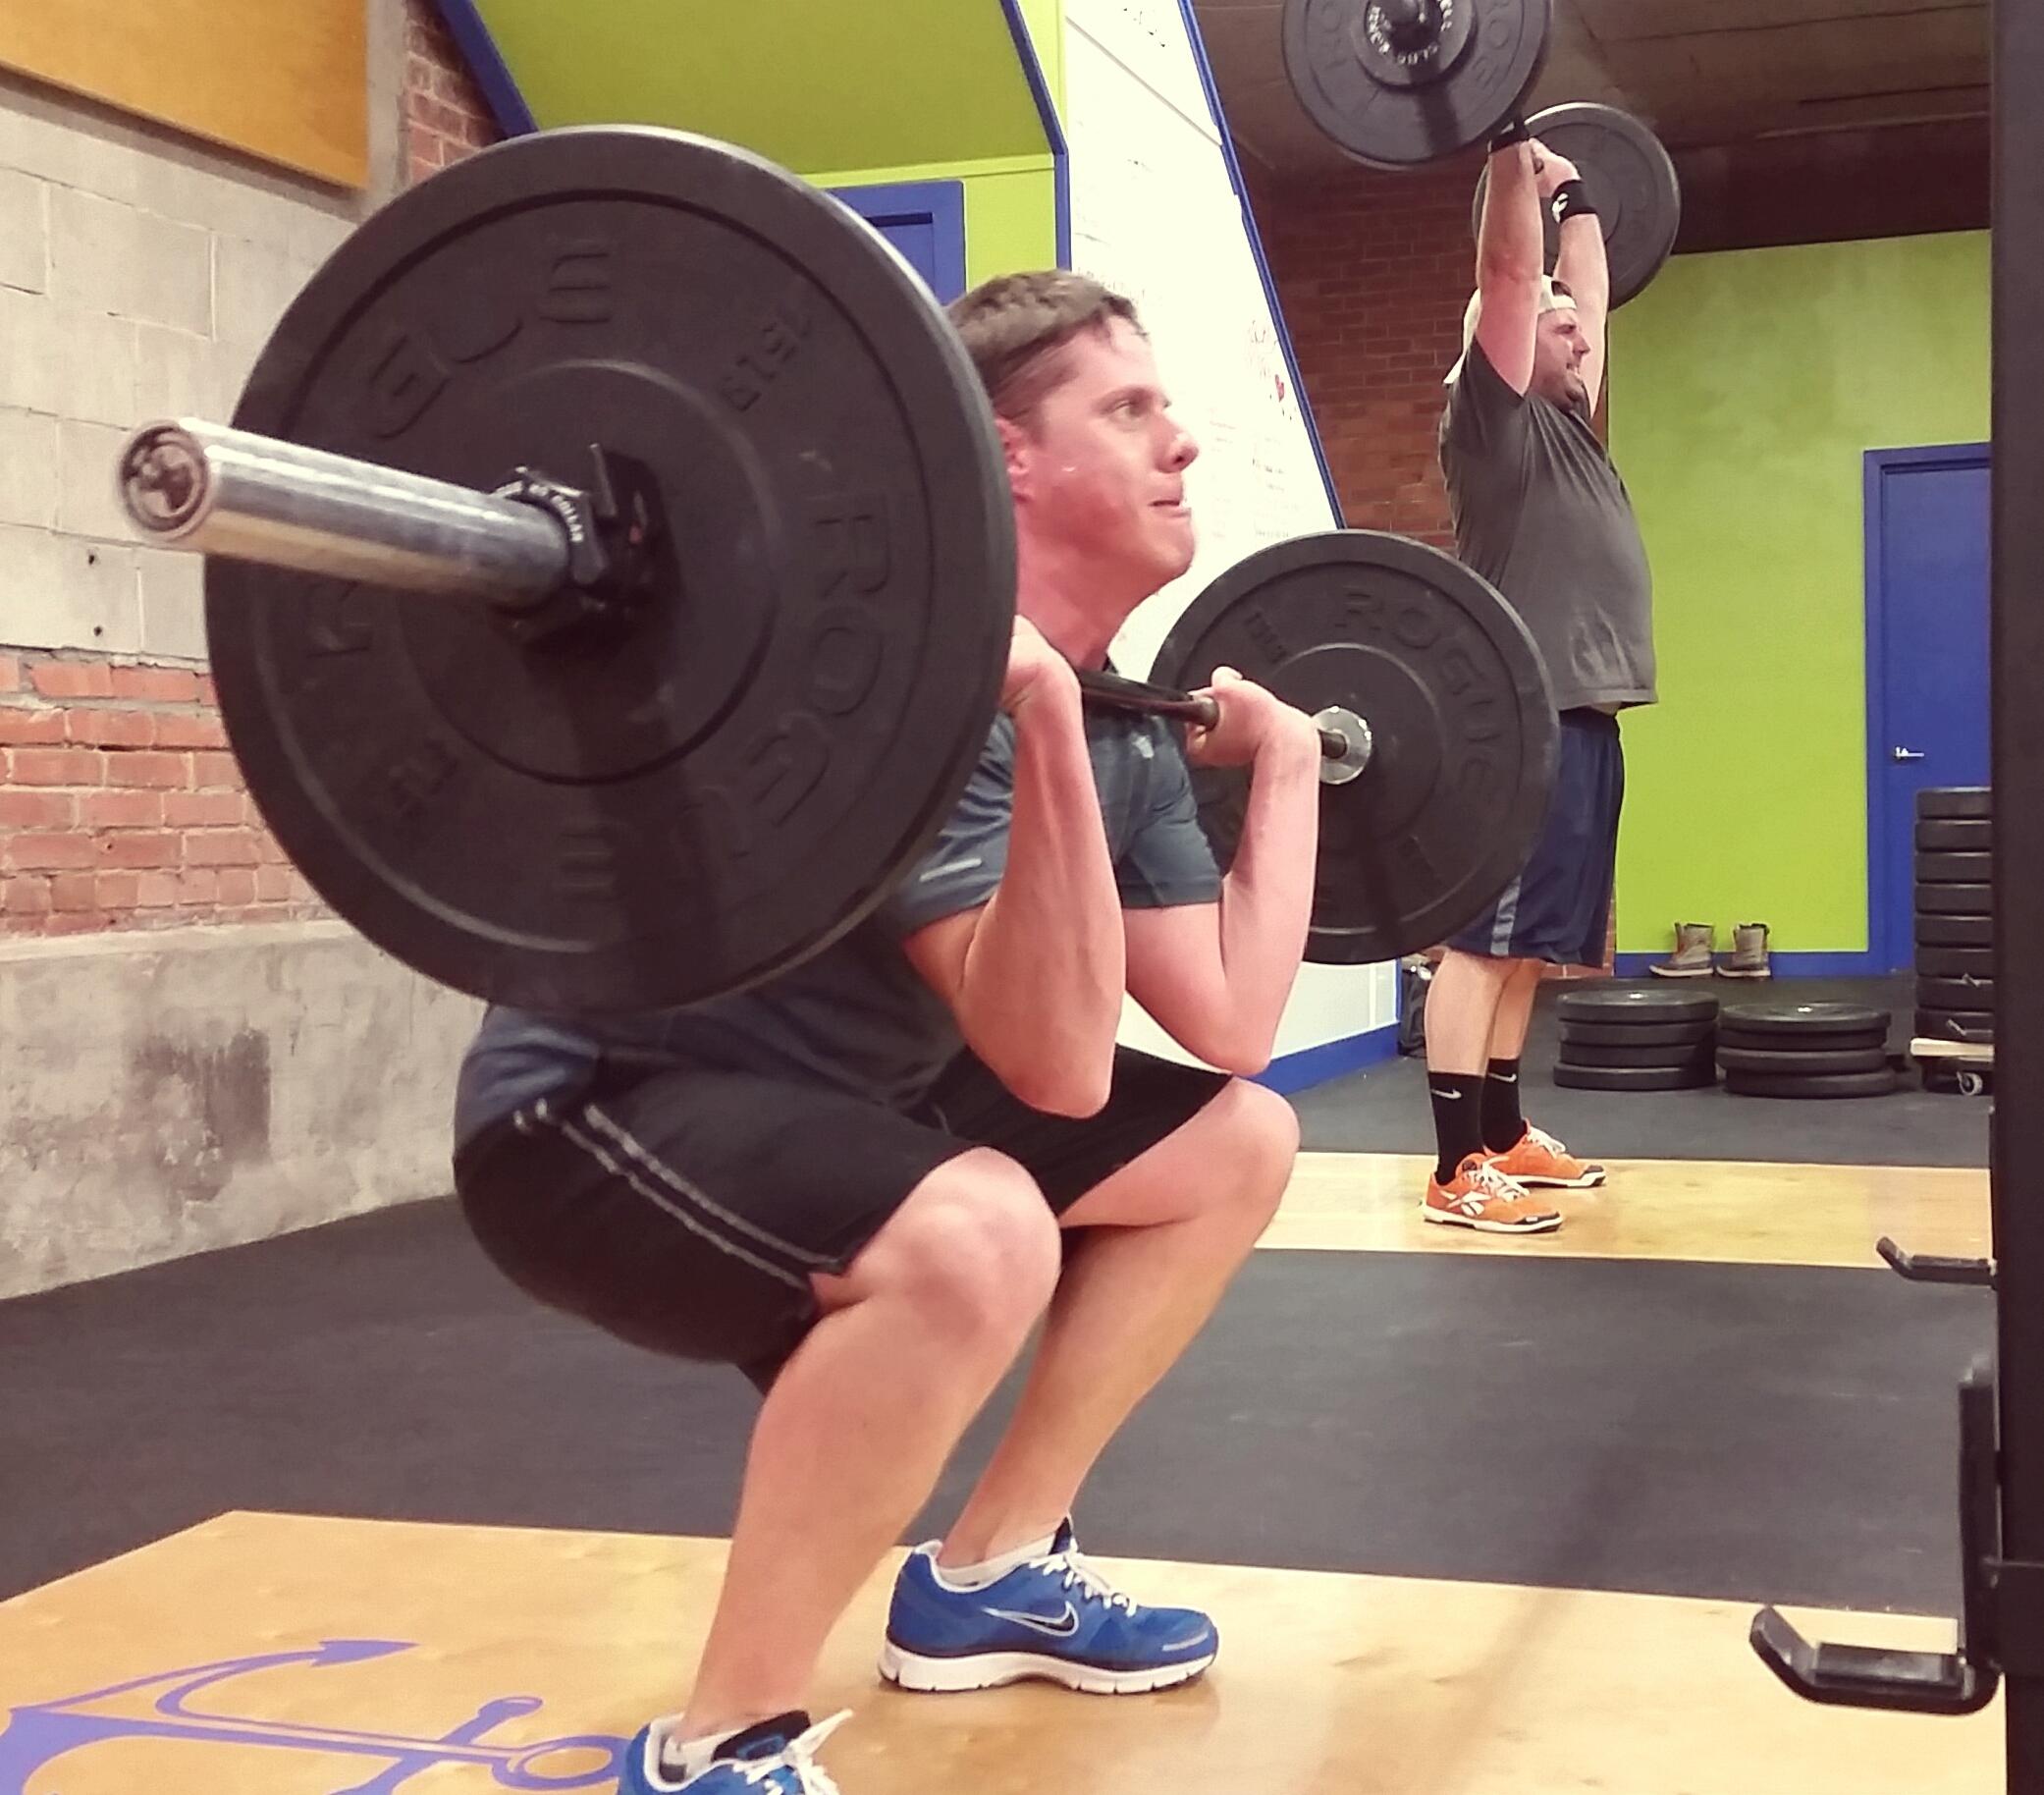 Crossfit front squat